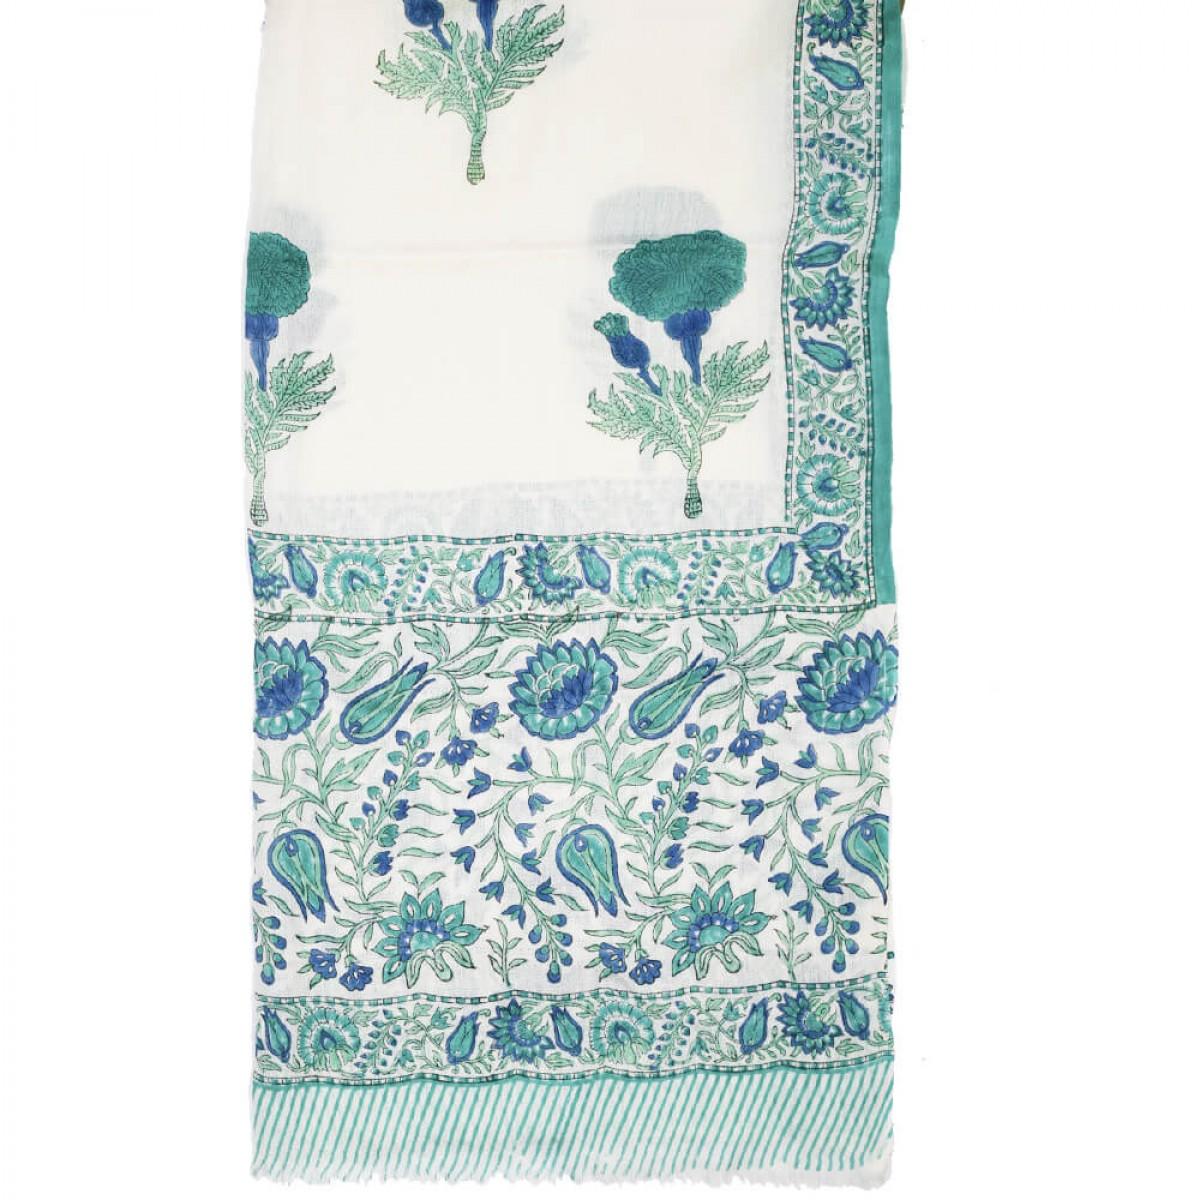 Block Printed Woolen Shawl - Cerulean